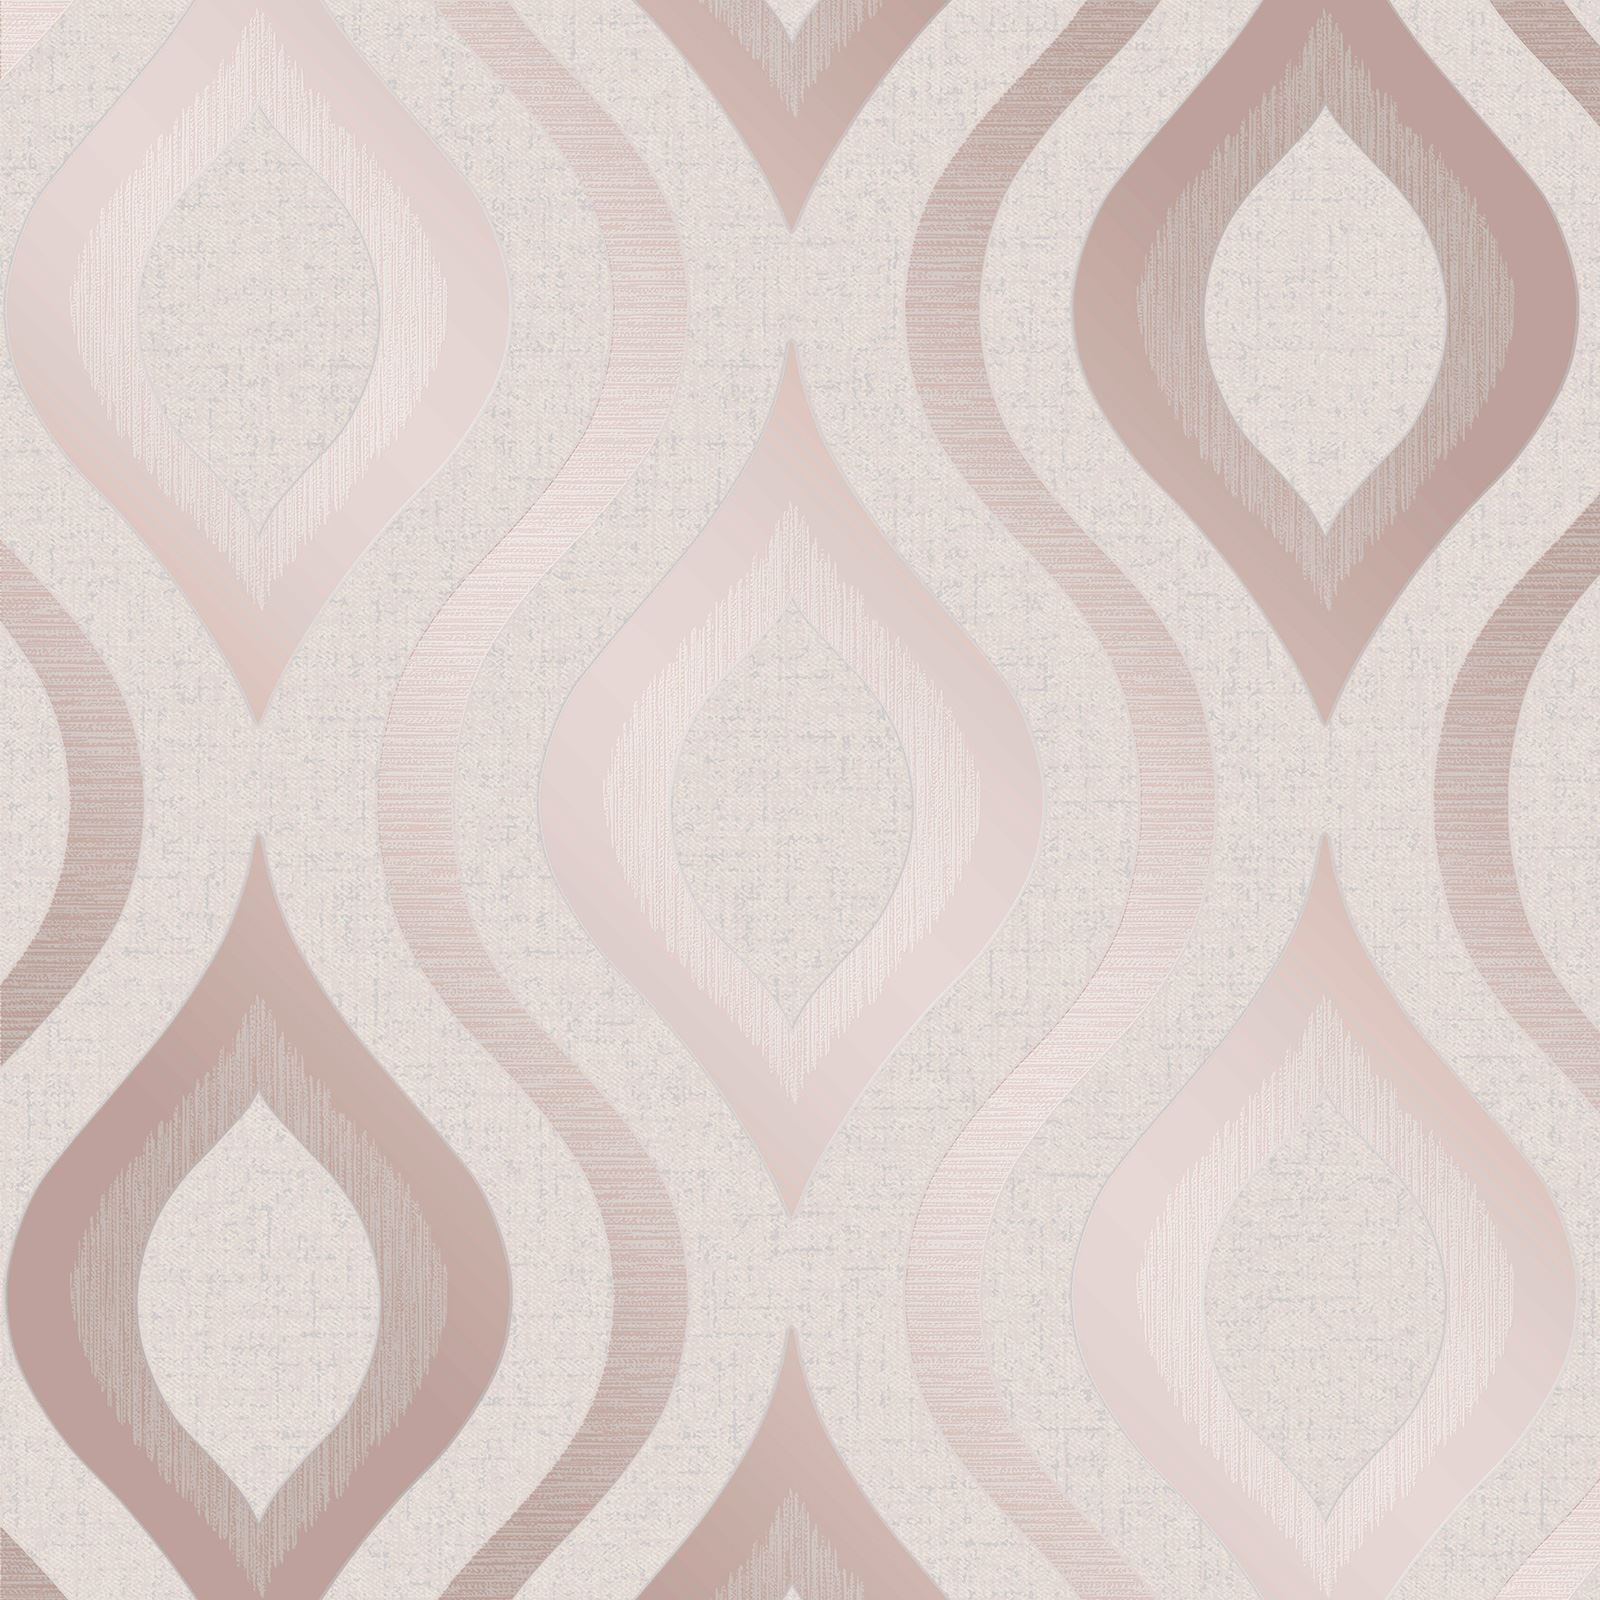 Quartz Metallic Rose Gold Glitter Geometric Retro Feature Wallpaper Fd42206 Geometric Wallpaper Rose Gold Rose Gold Wallpaper Geometric Wallpaper